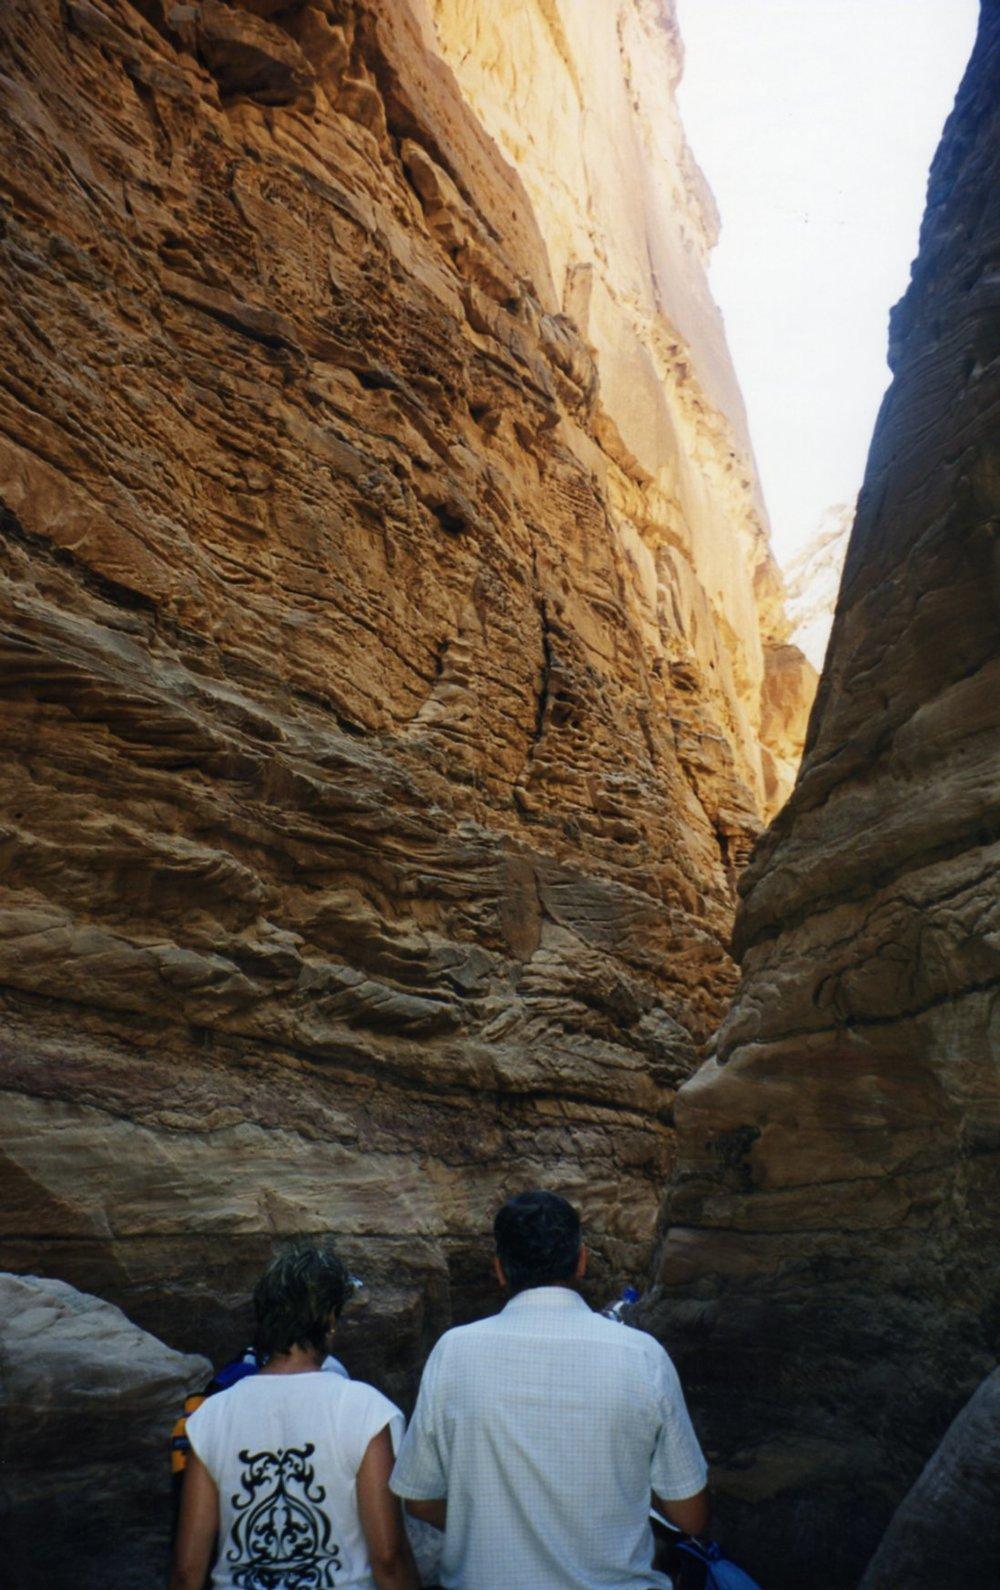 Squeezing through the canyon